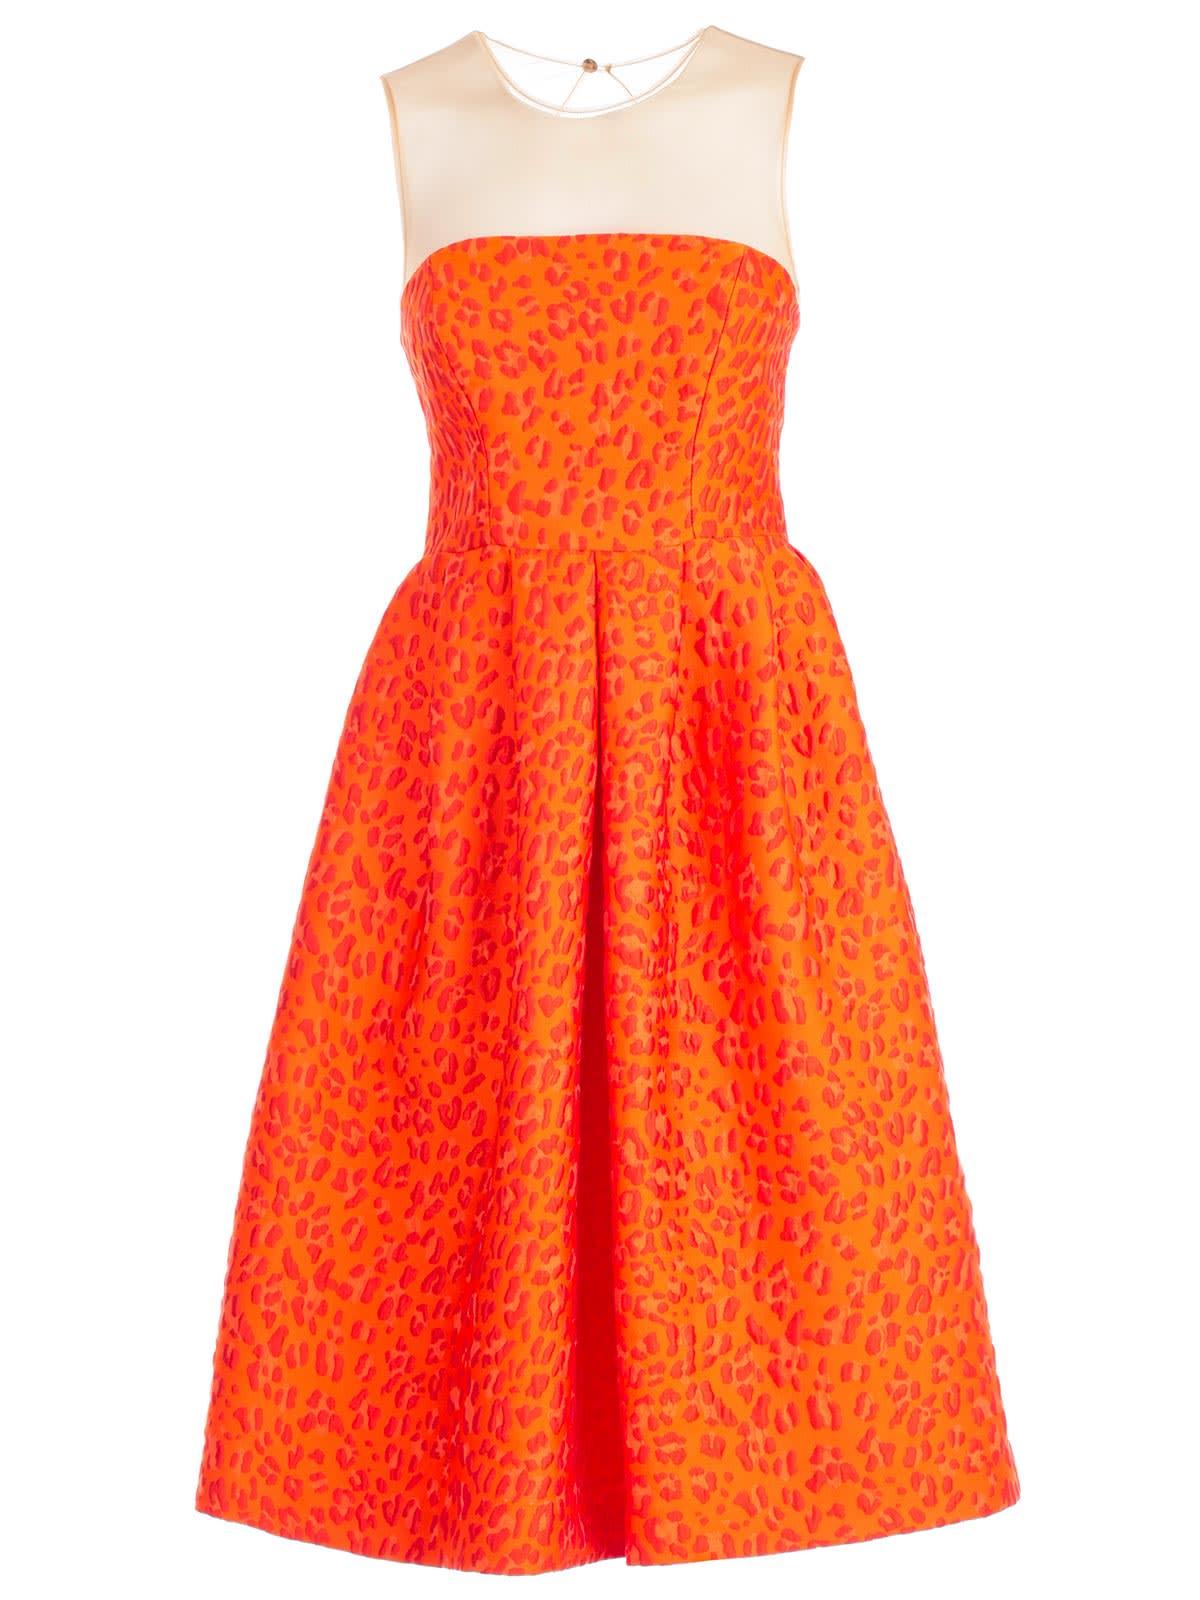 Parosh Strapless Dress